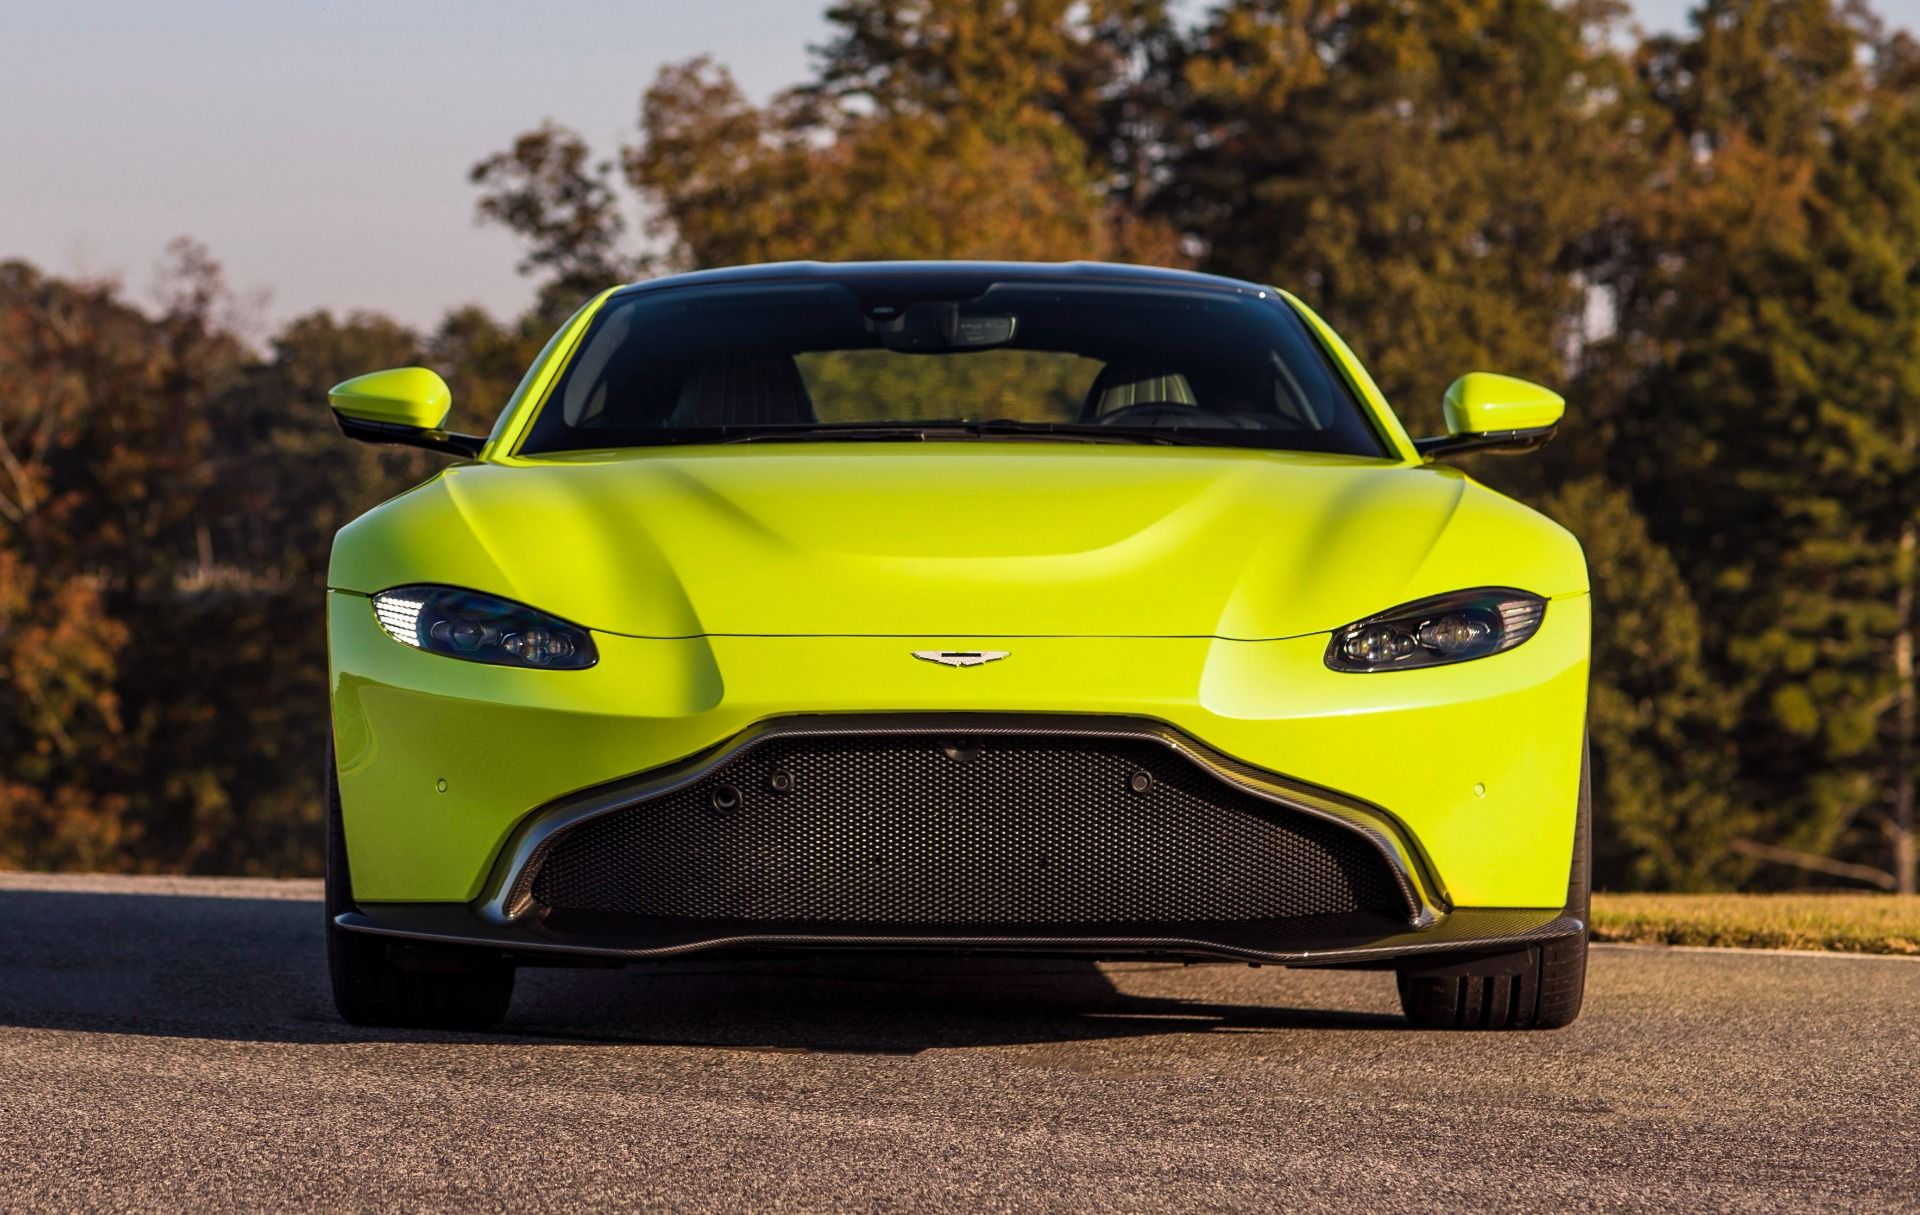 2018 Aston Martin Vantage Aston Martin Vantage Aston Martin Vanquish Aston Martin